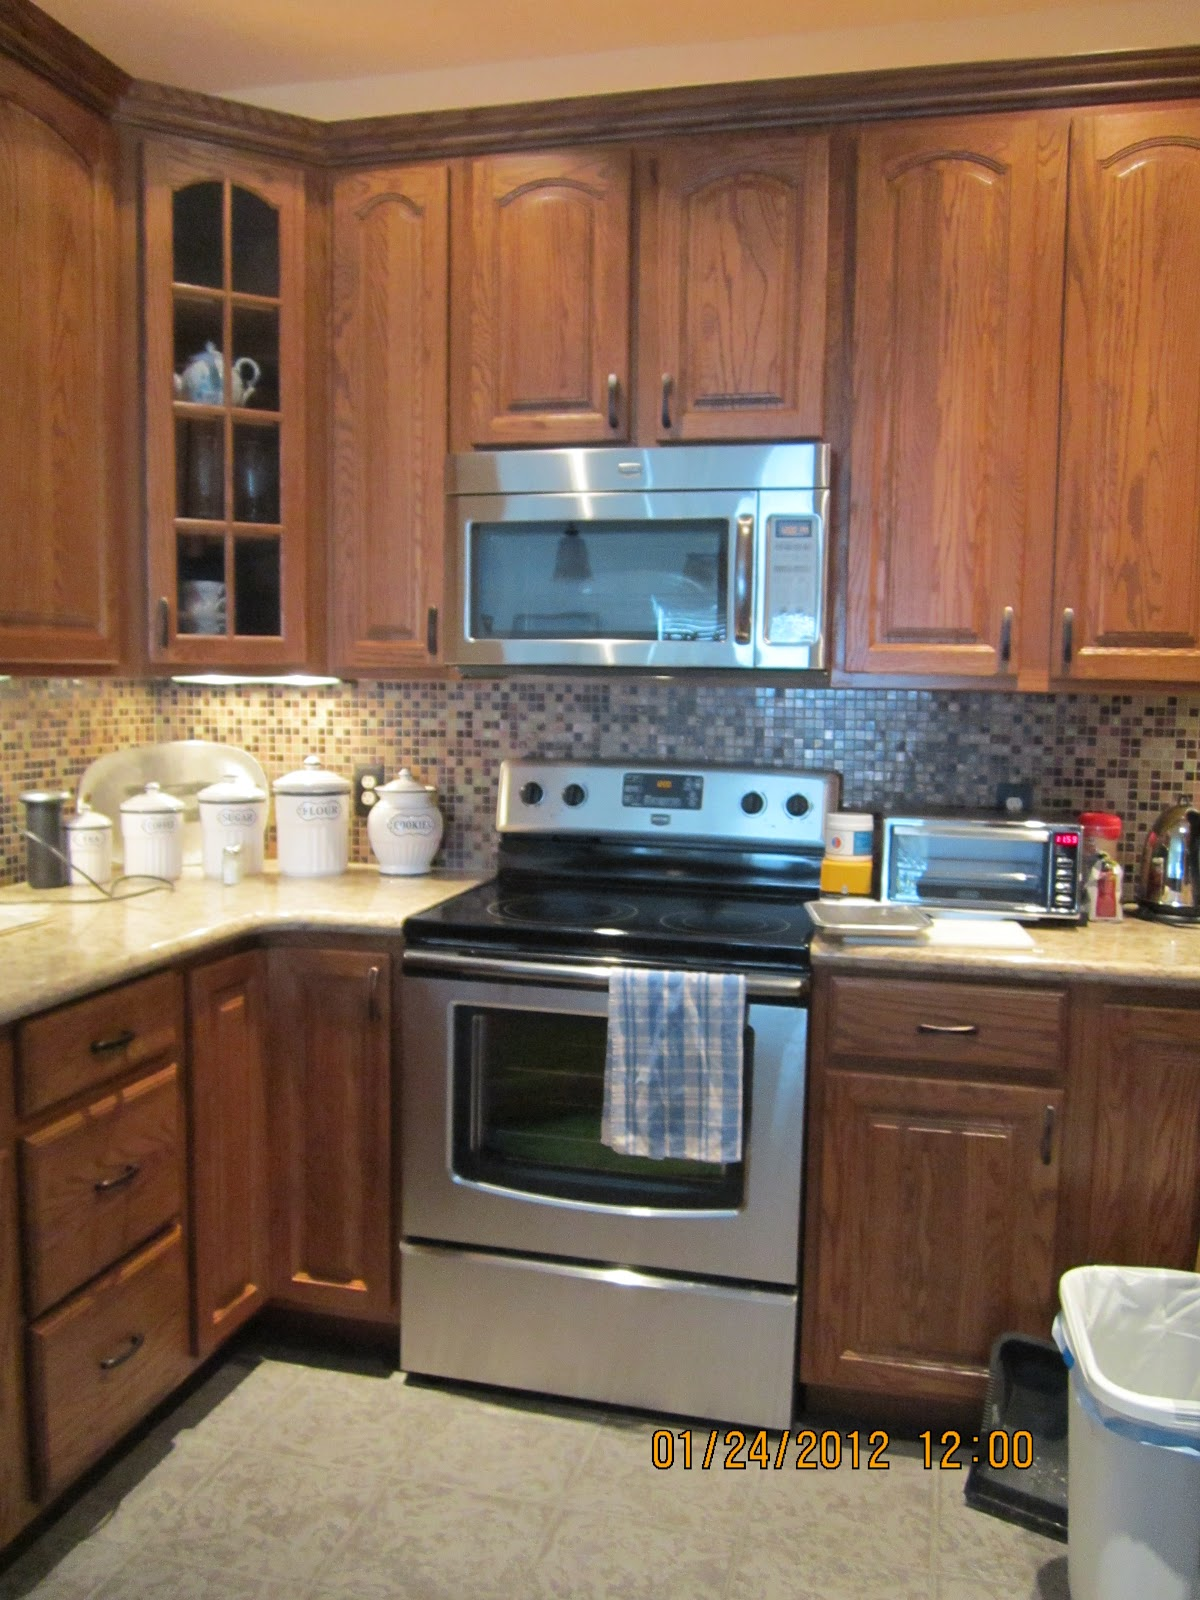 ah ha My exact color cabinet American woodmark oak tawny